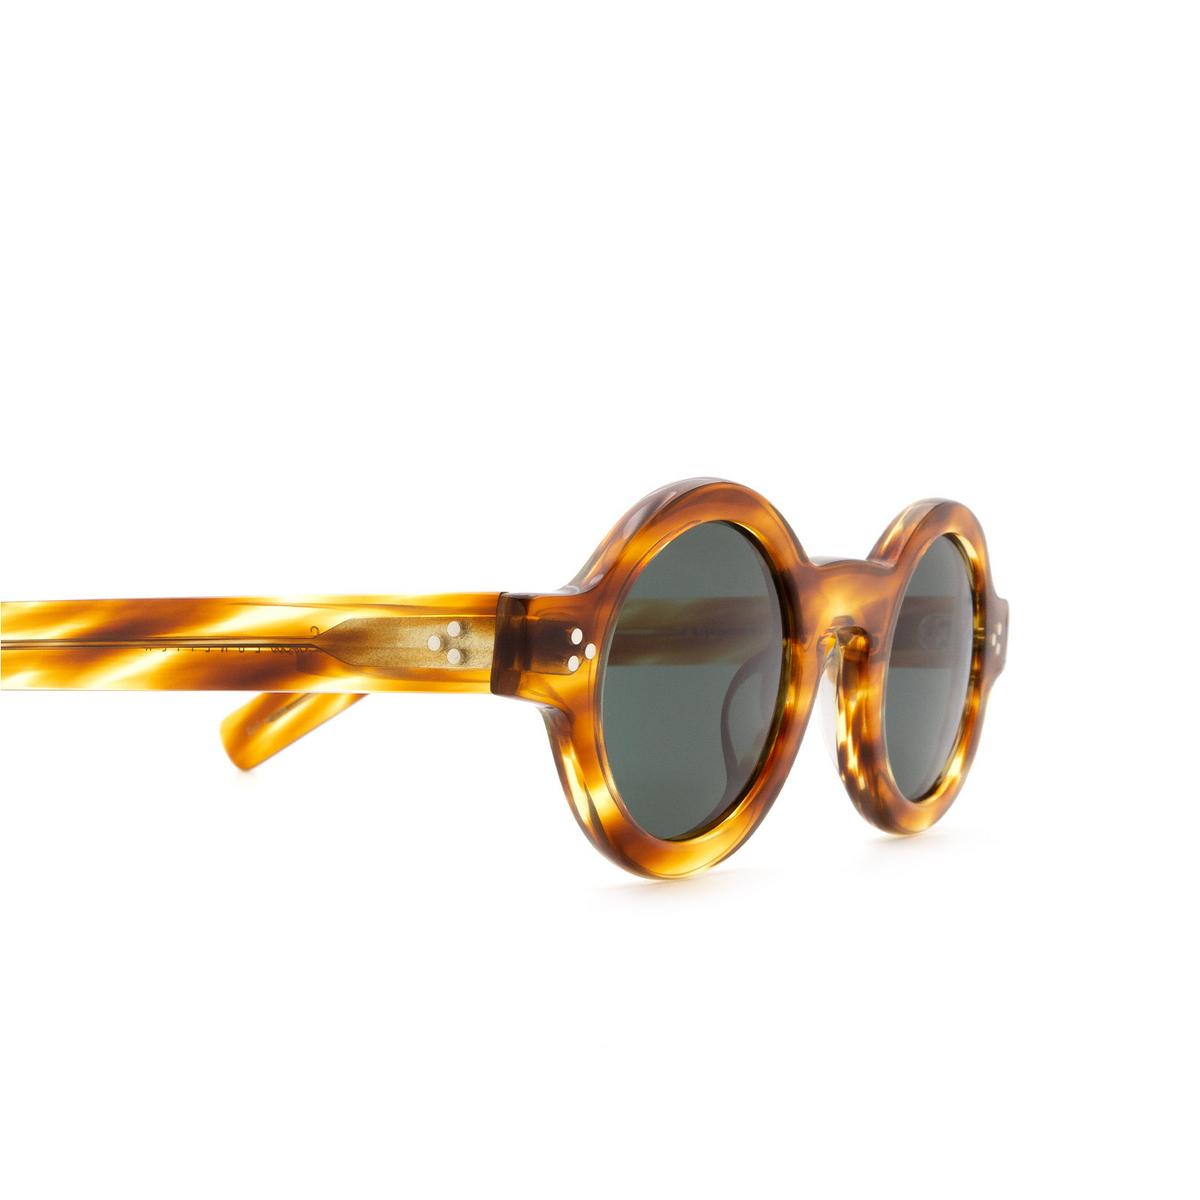 Lesca® Round Sunglasses: Tabu color Écaille Clair A8 - 3/3.